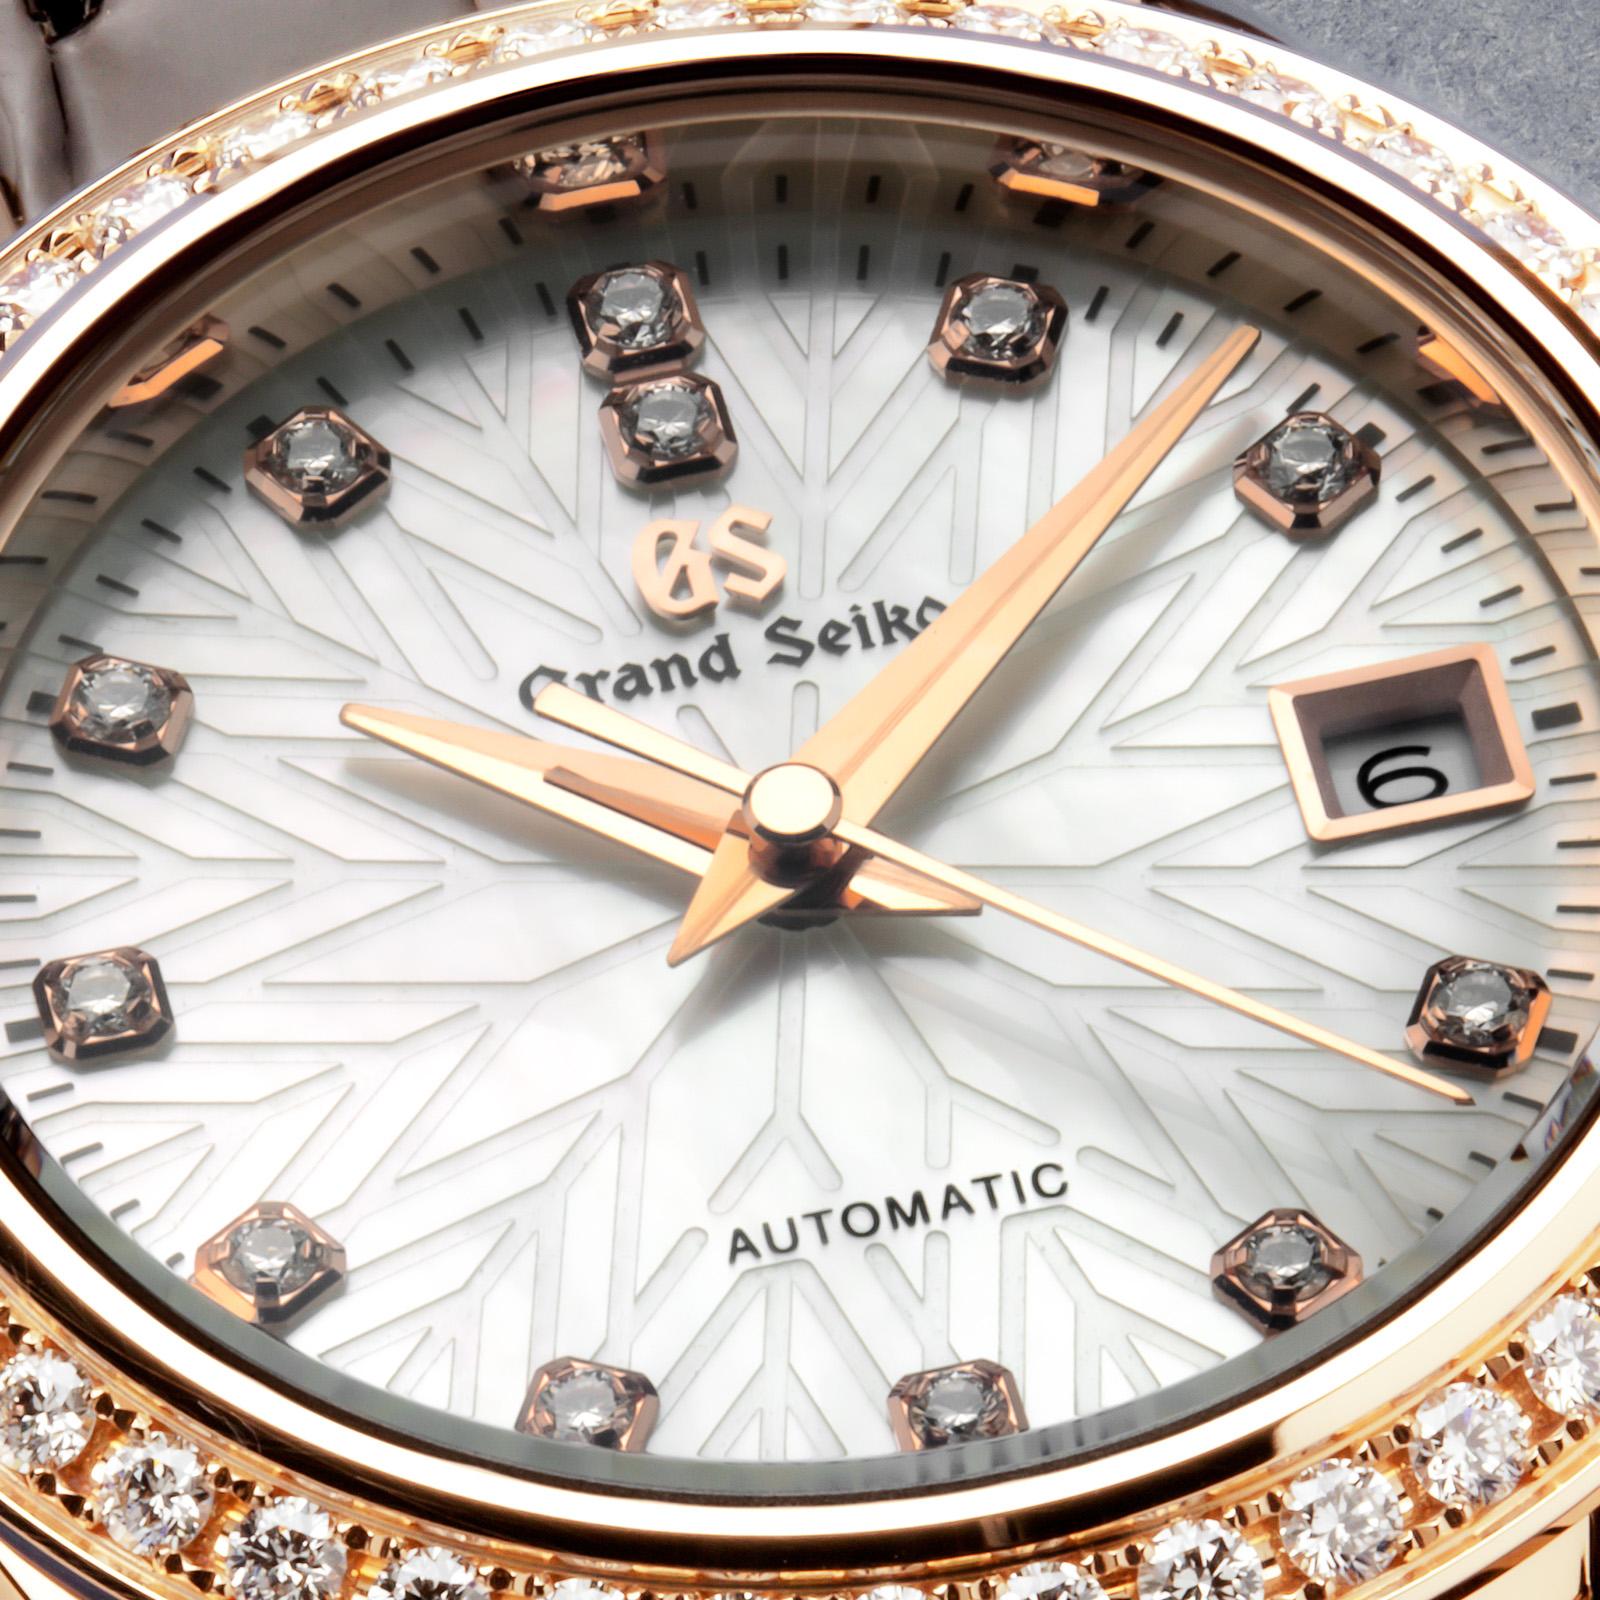 Grand Seiko wristwatch STGK006 - dial macro highlighting the snowflake motif.